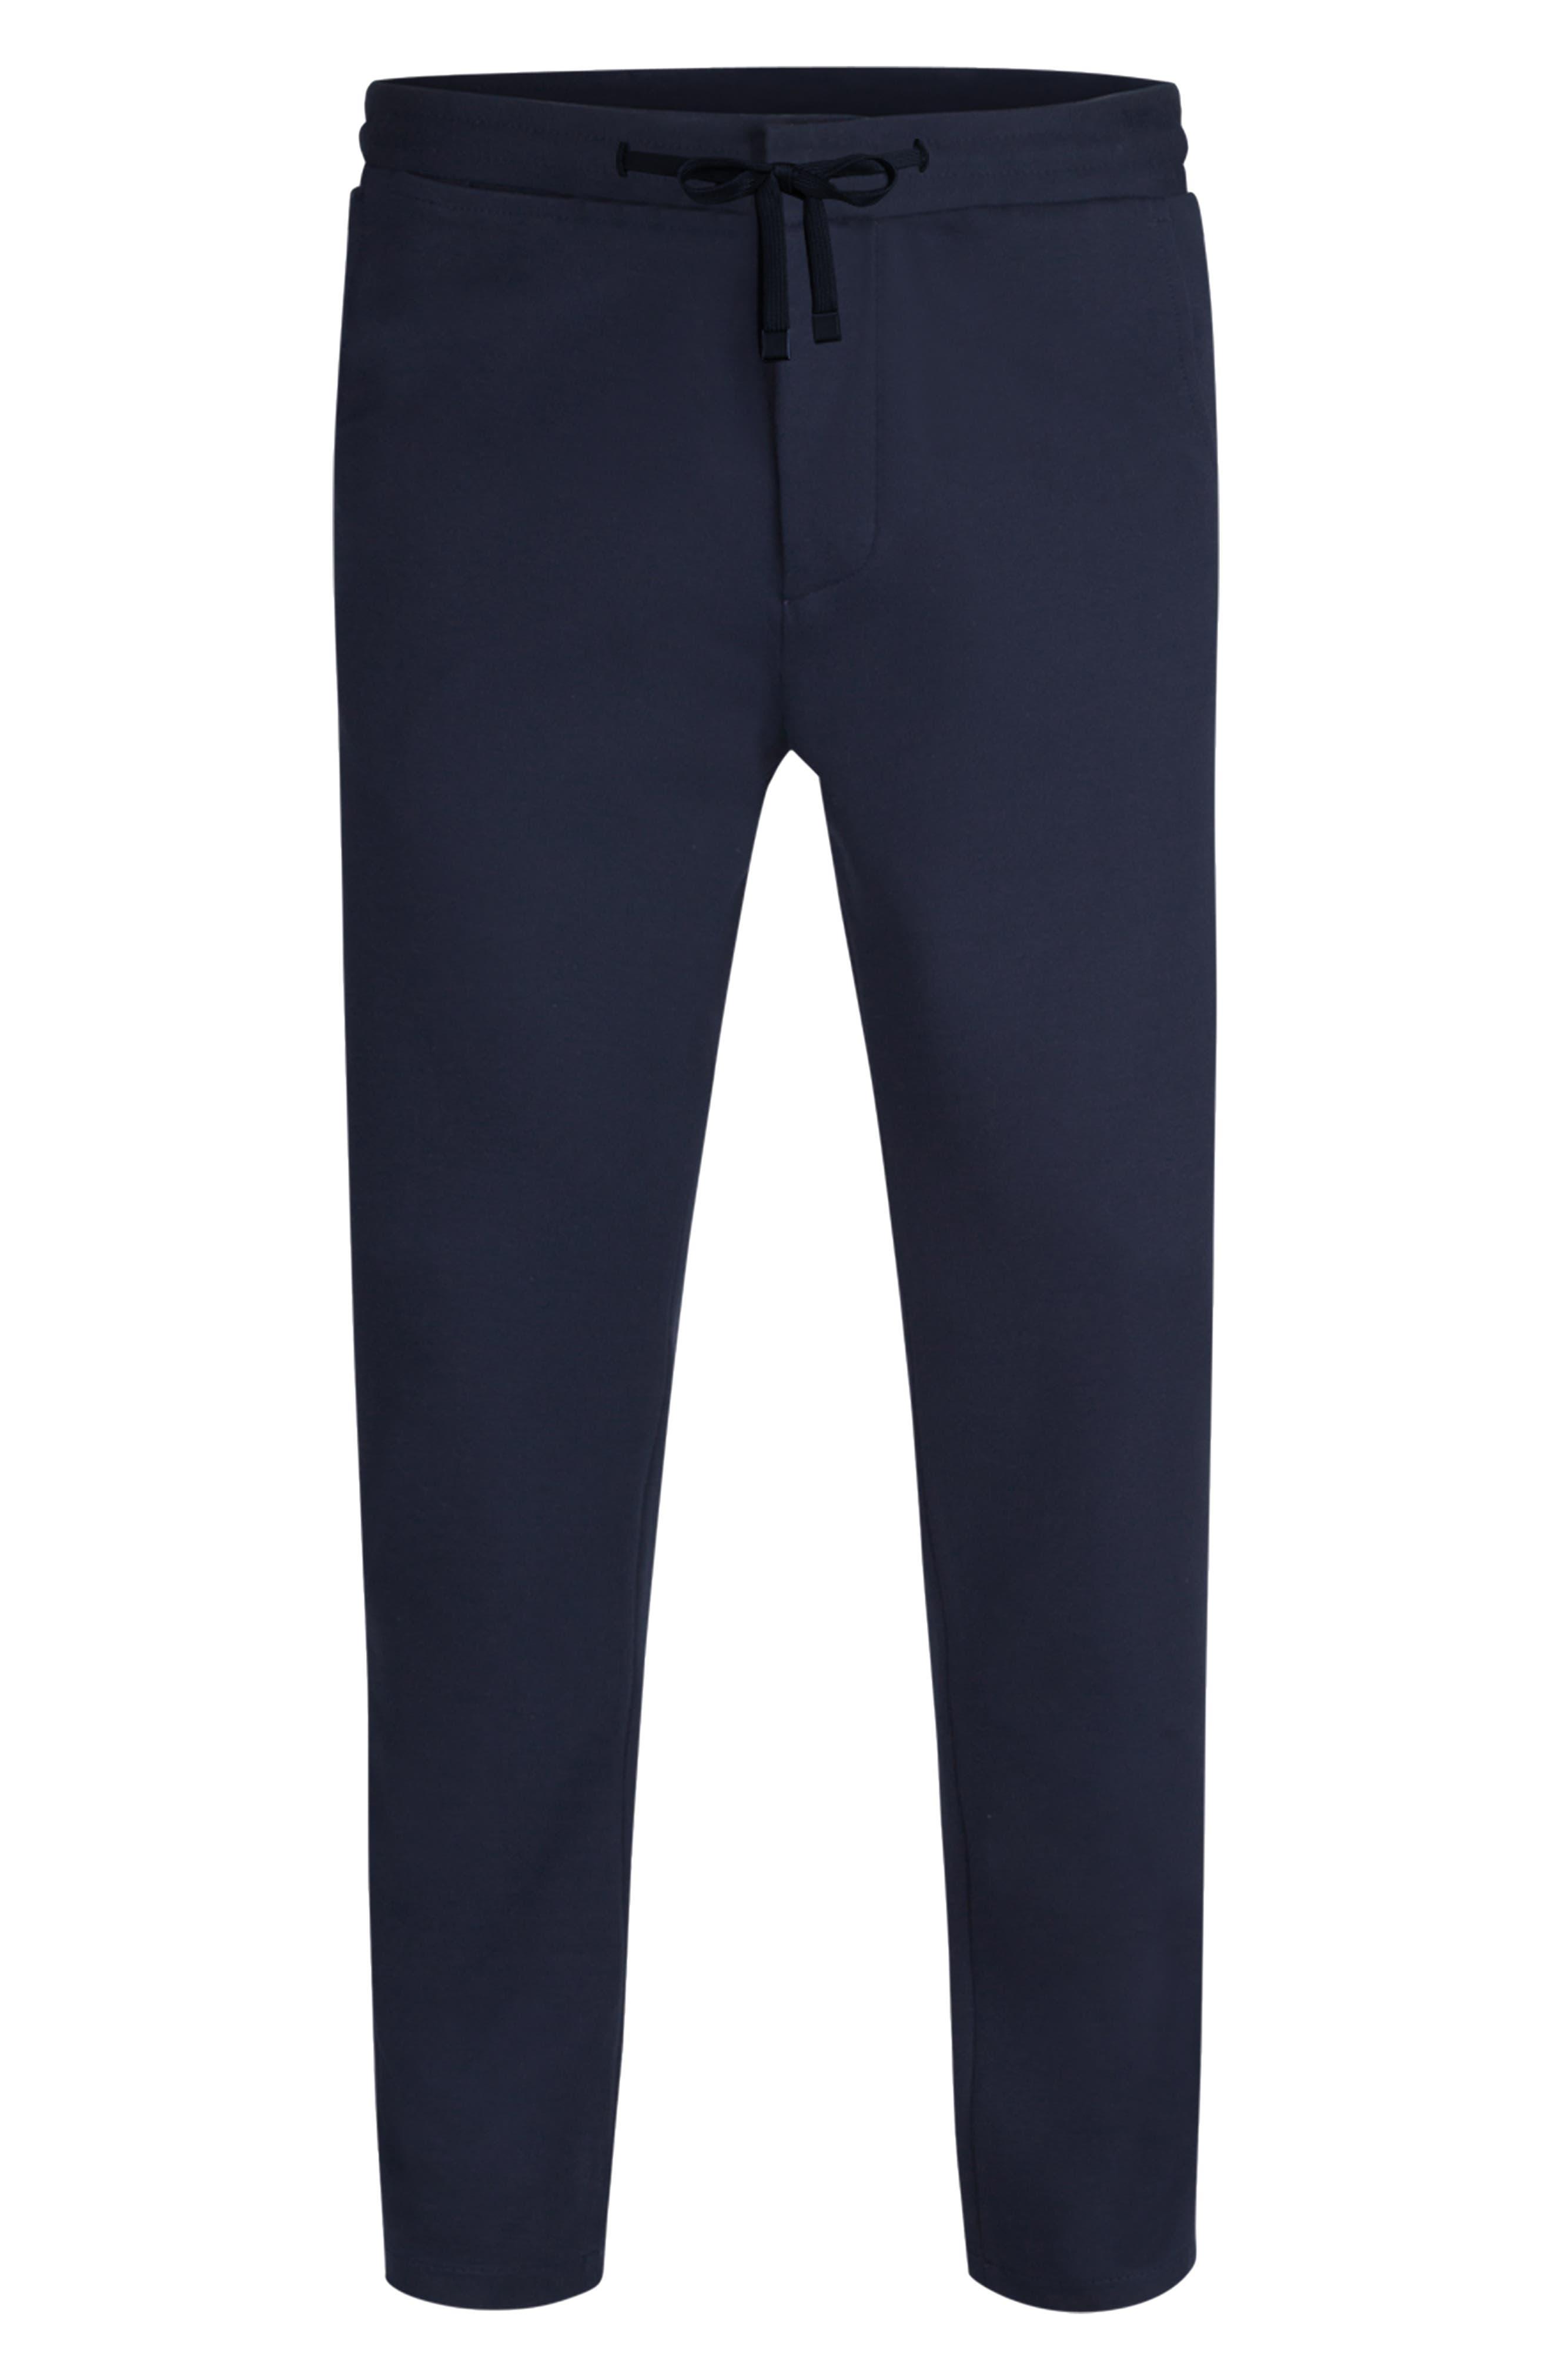 Men's Bugatchi Stretch Cotton Blend Sweatpants